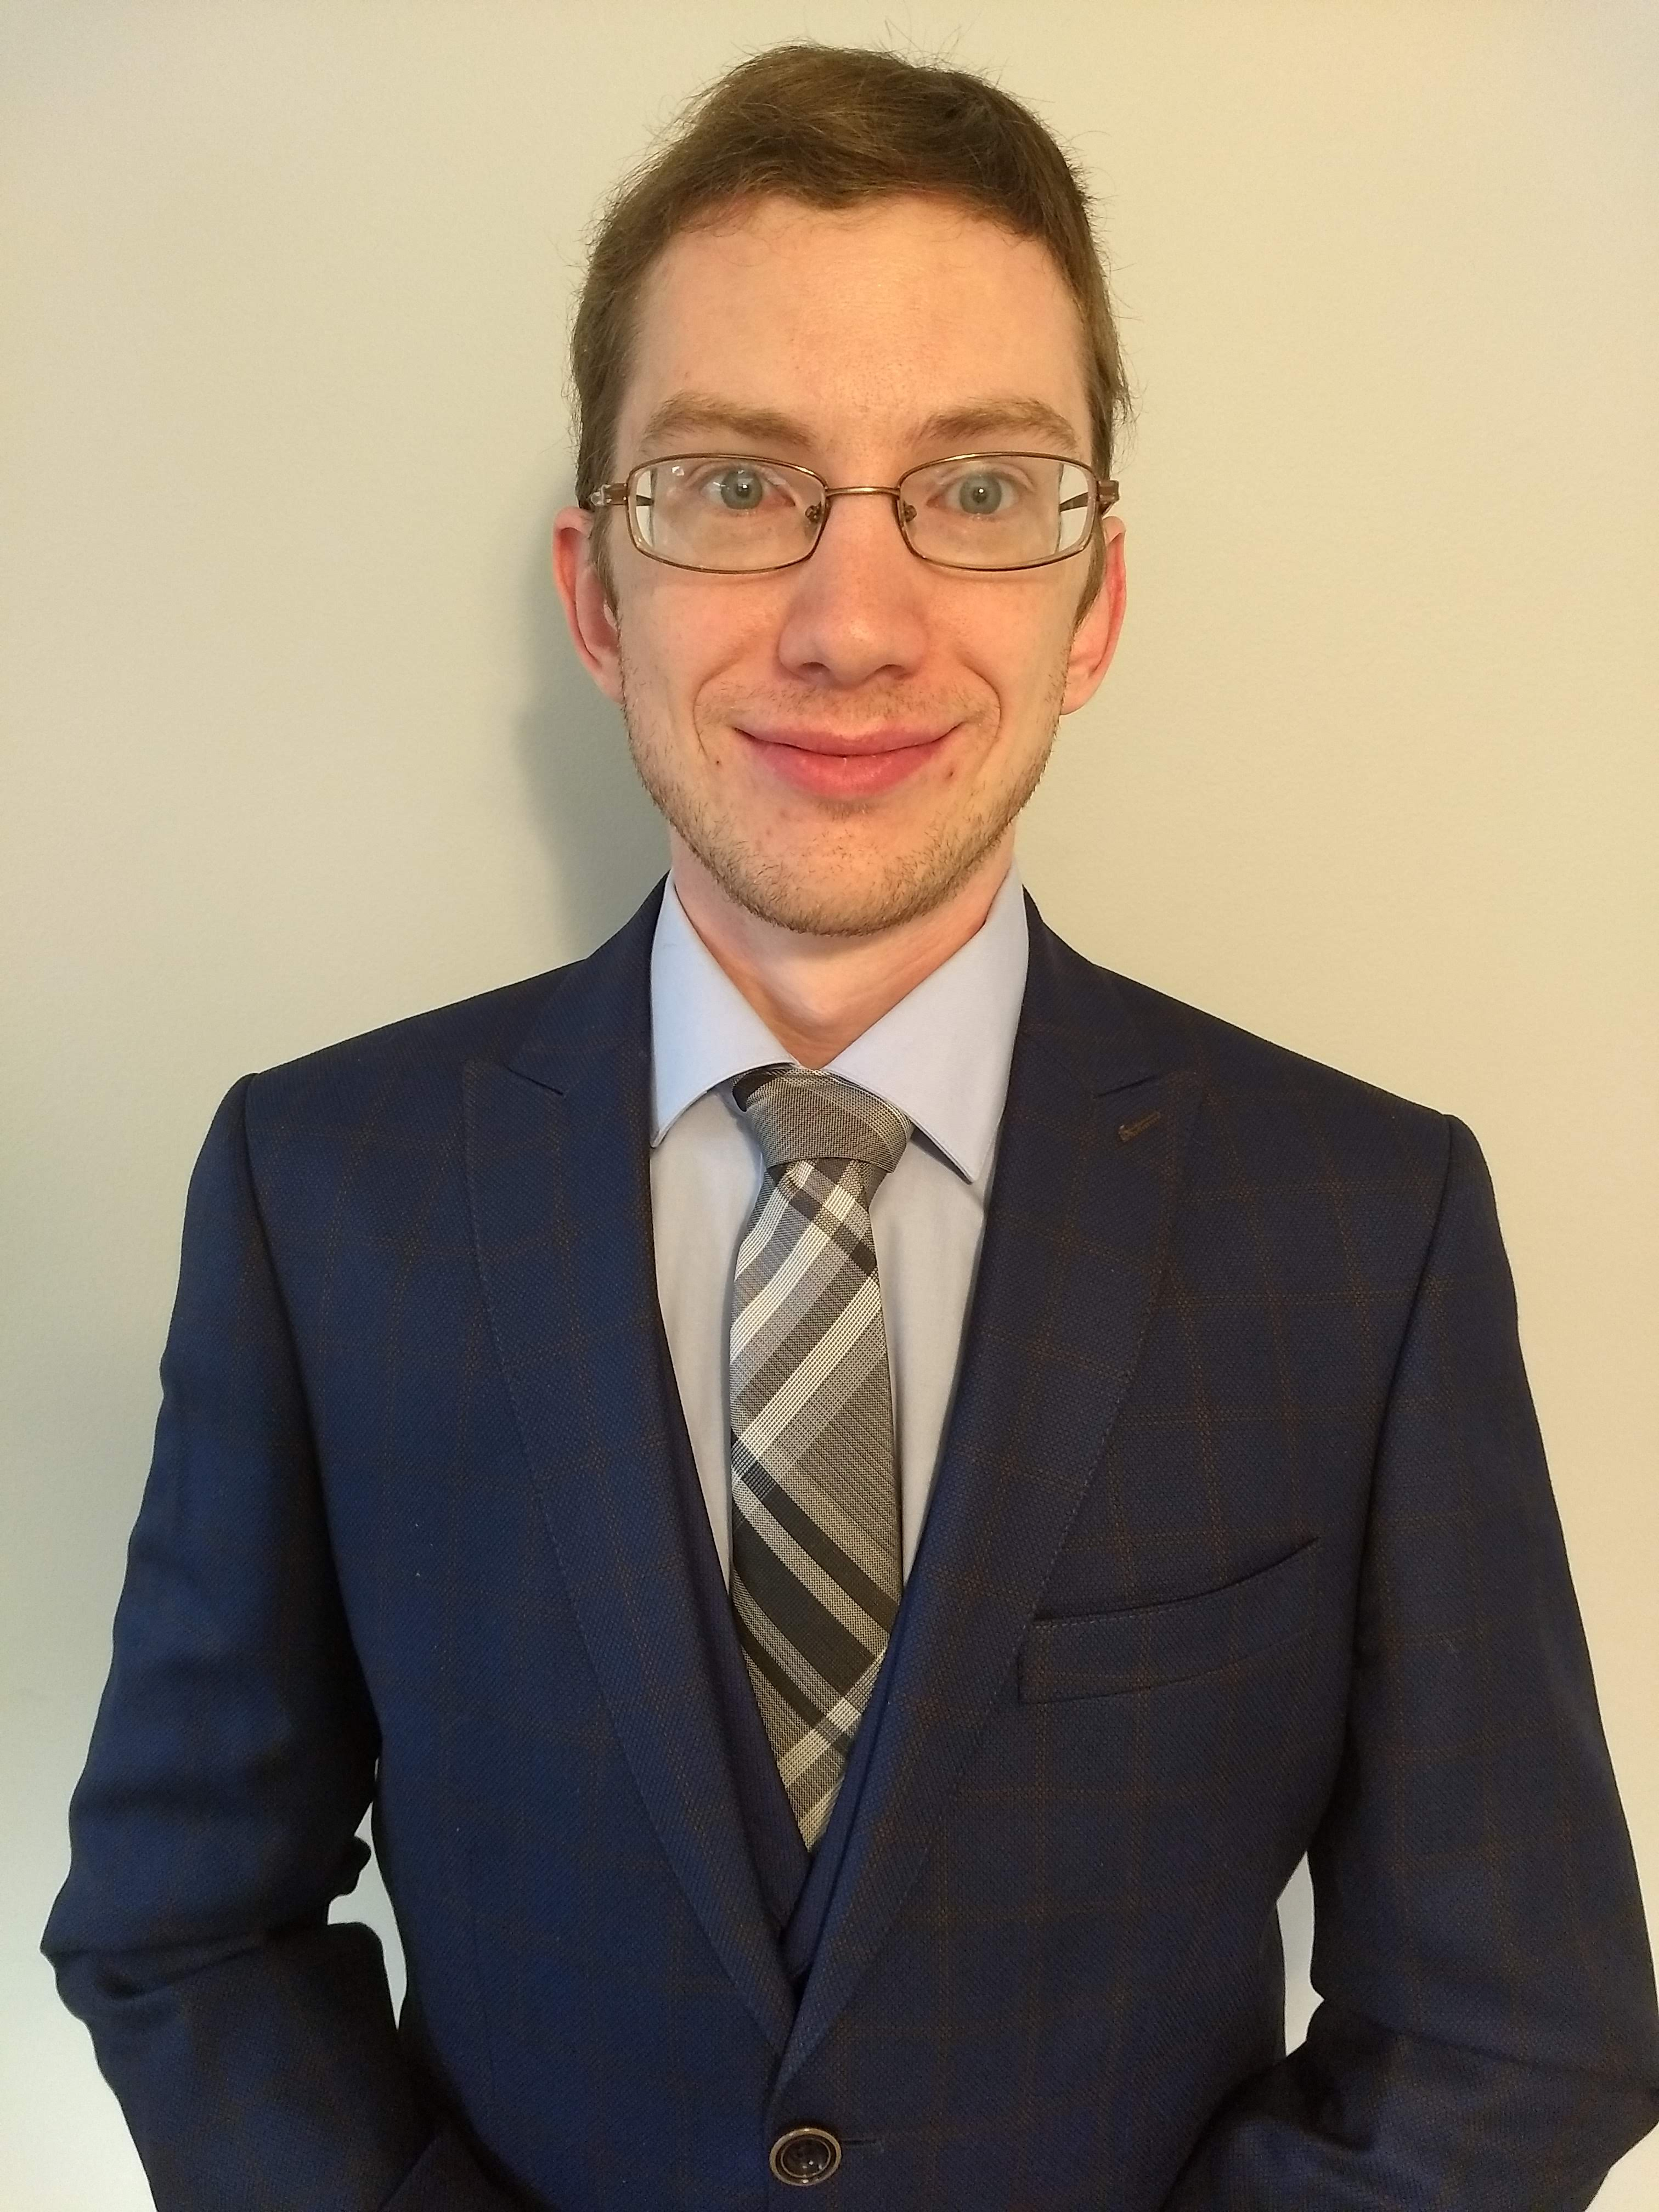 ANDREW ROBERT BOSTON Financial Professional & Insurance Agent